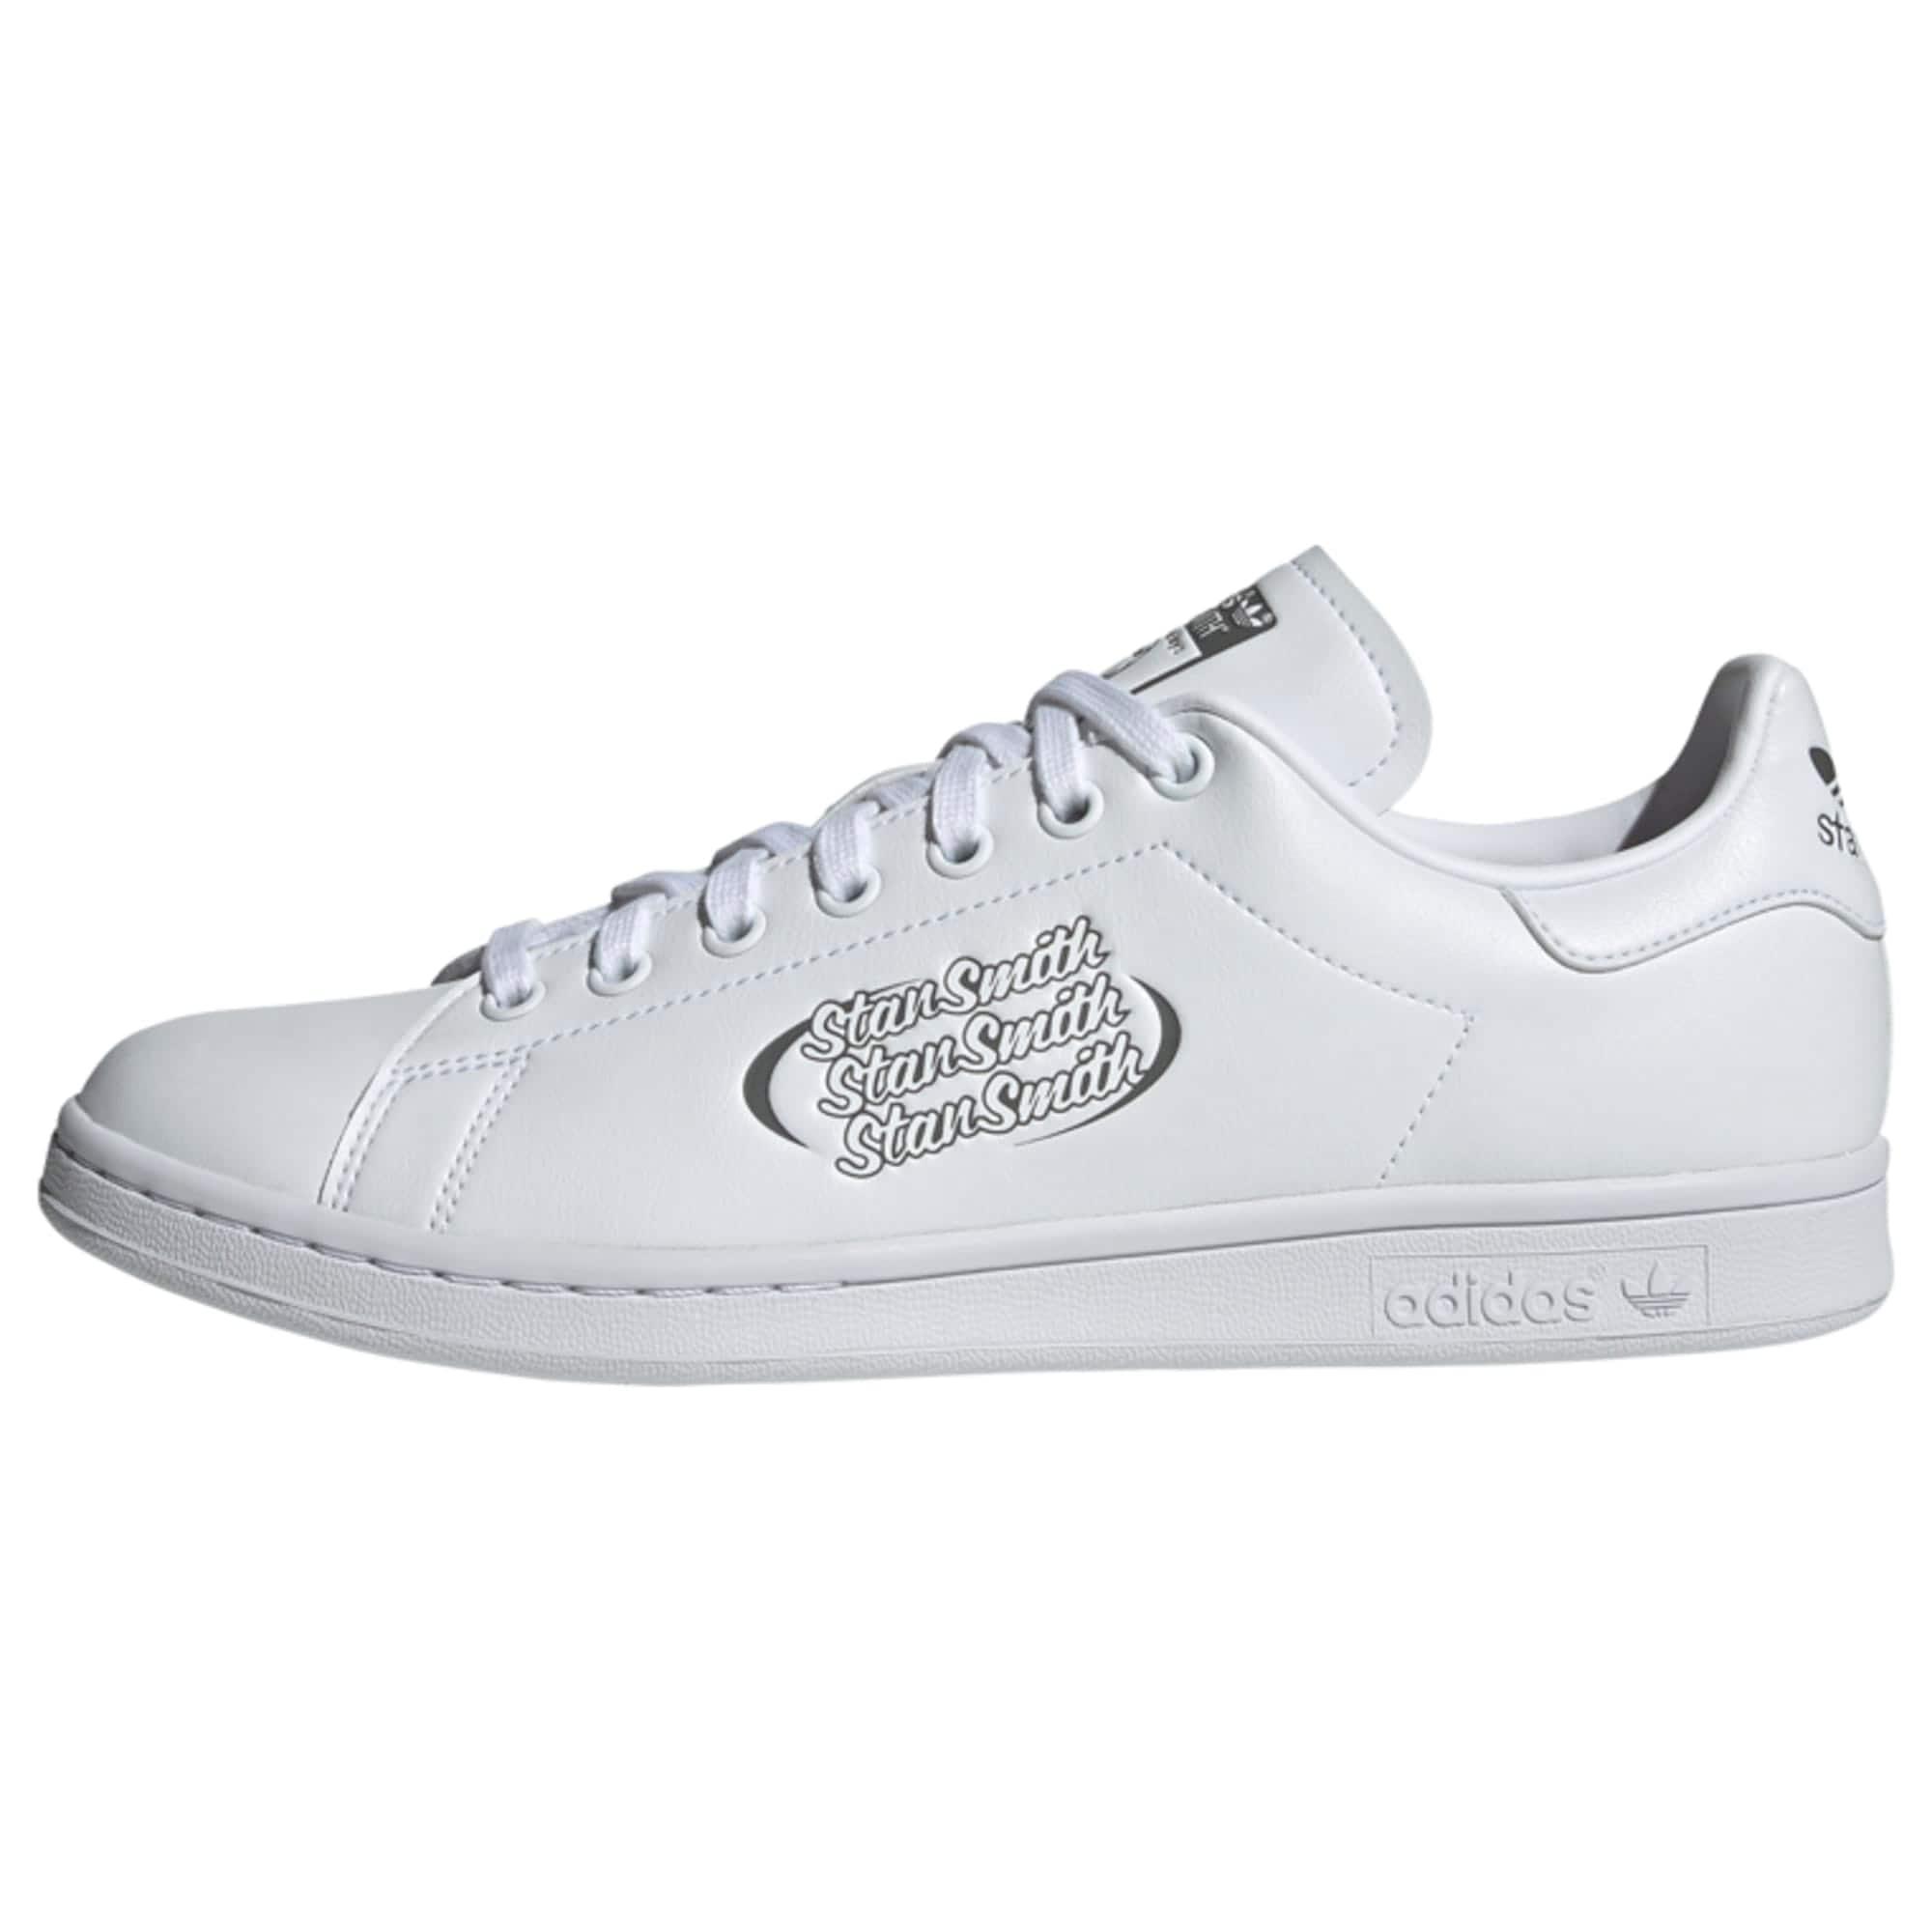 ADIDAS ORIGINALS Tenisky  bílá / tmavě šedá